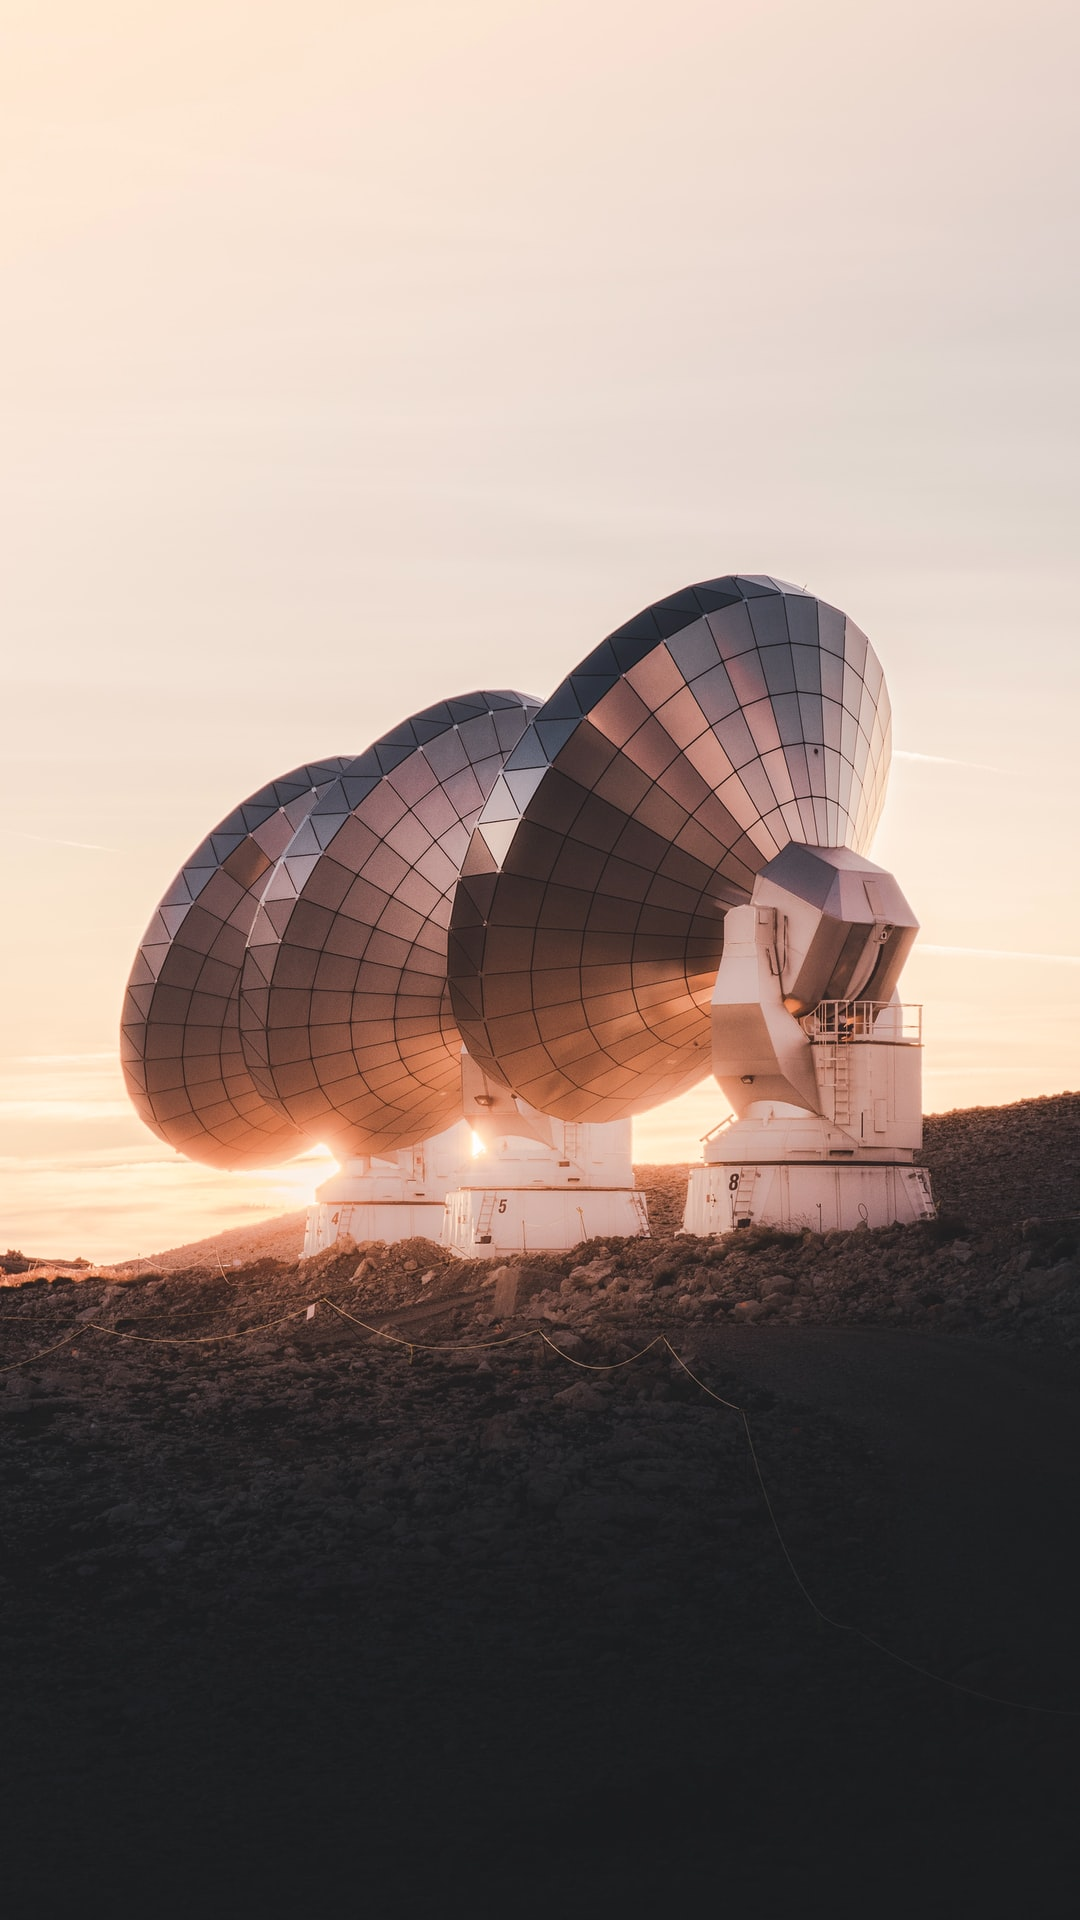 Antennes radio au coucher du soleil